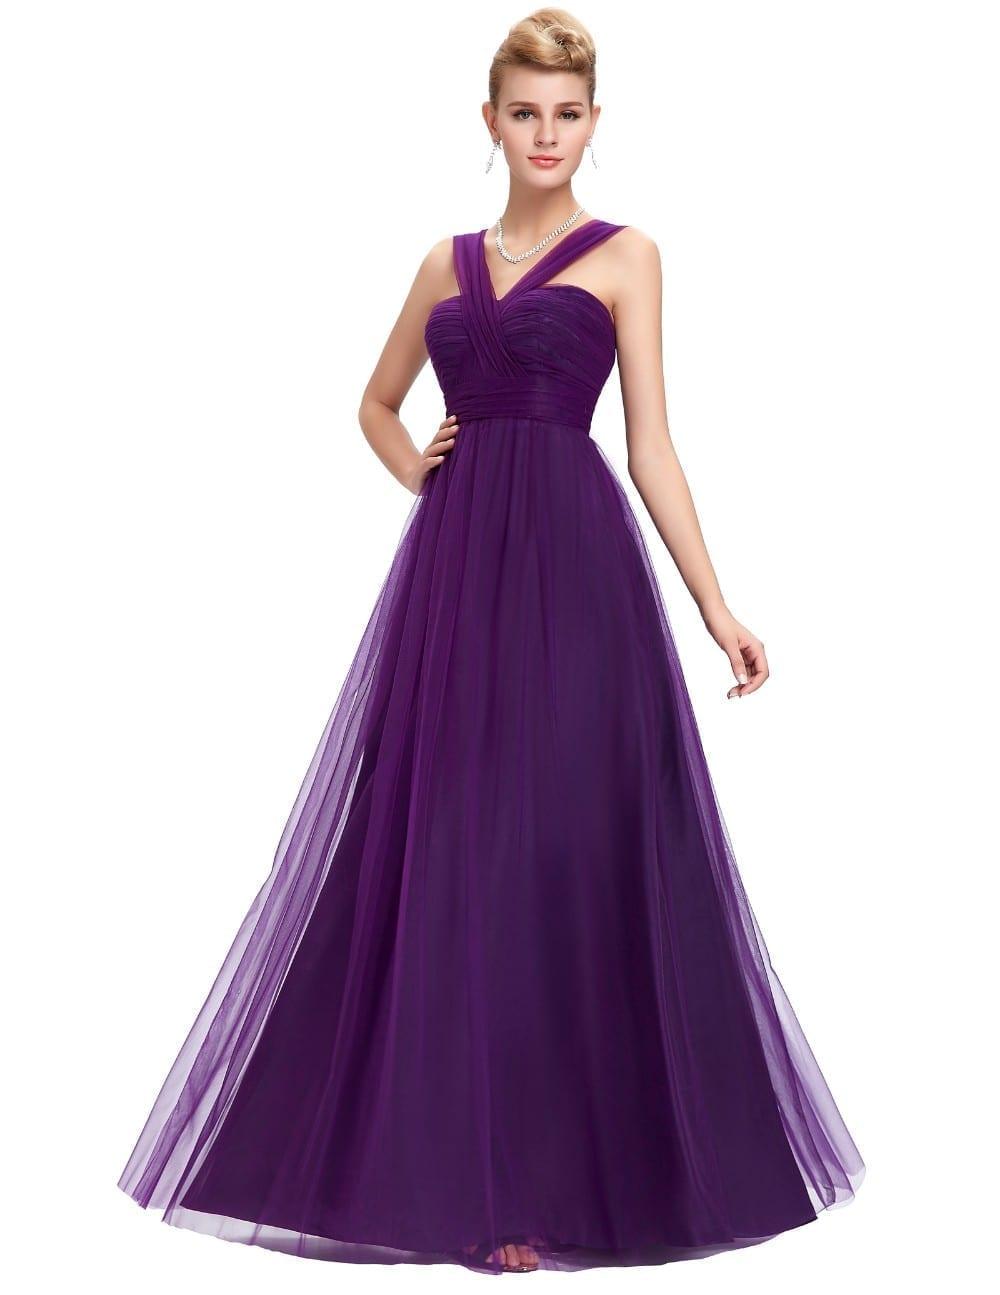 Long Purple Tulle Backless Elegant Bridesmaid Dress